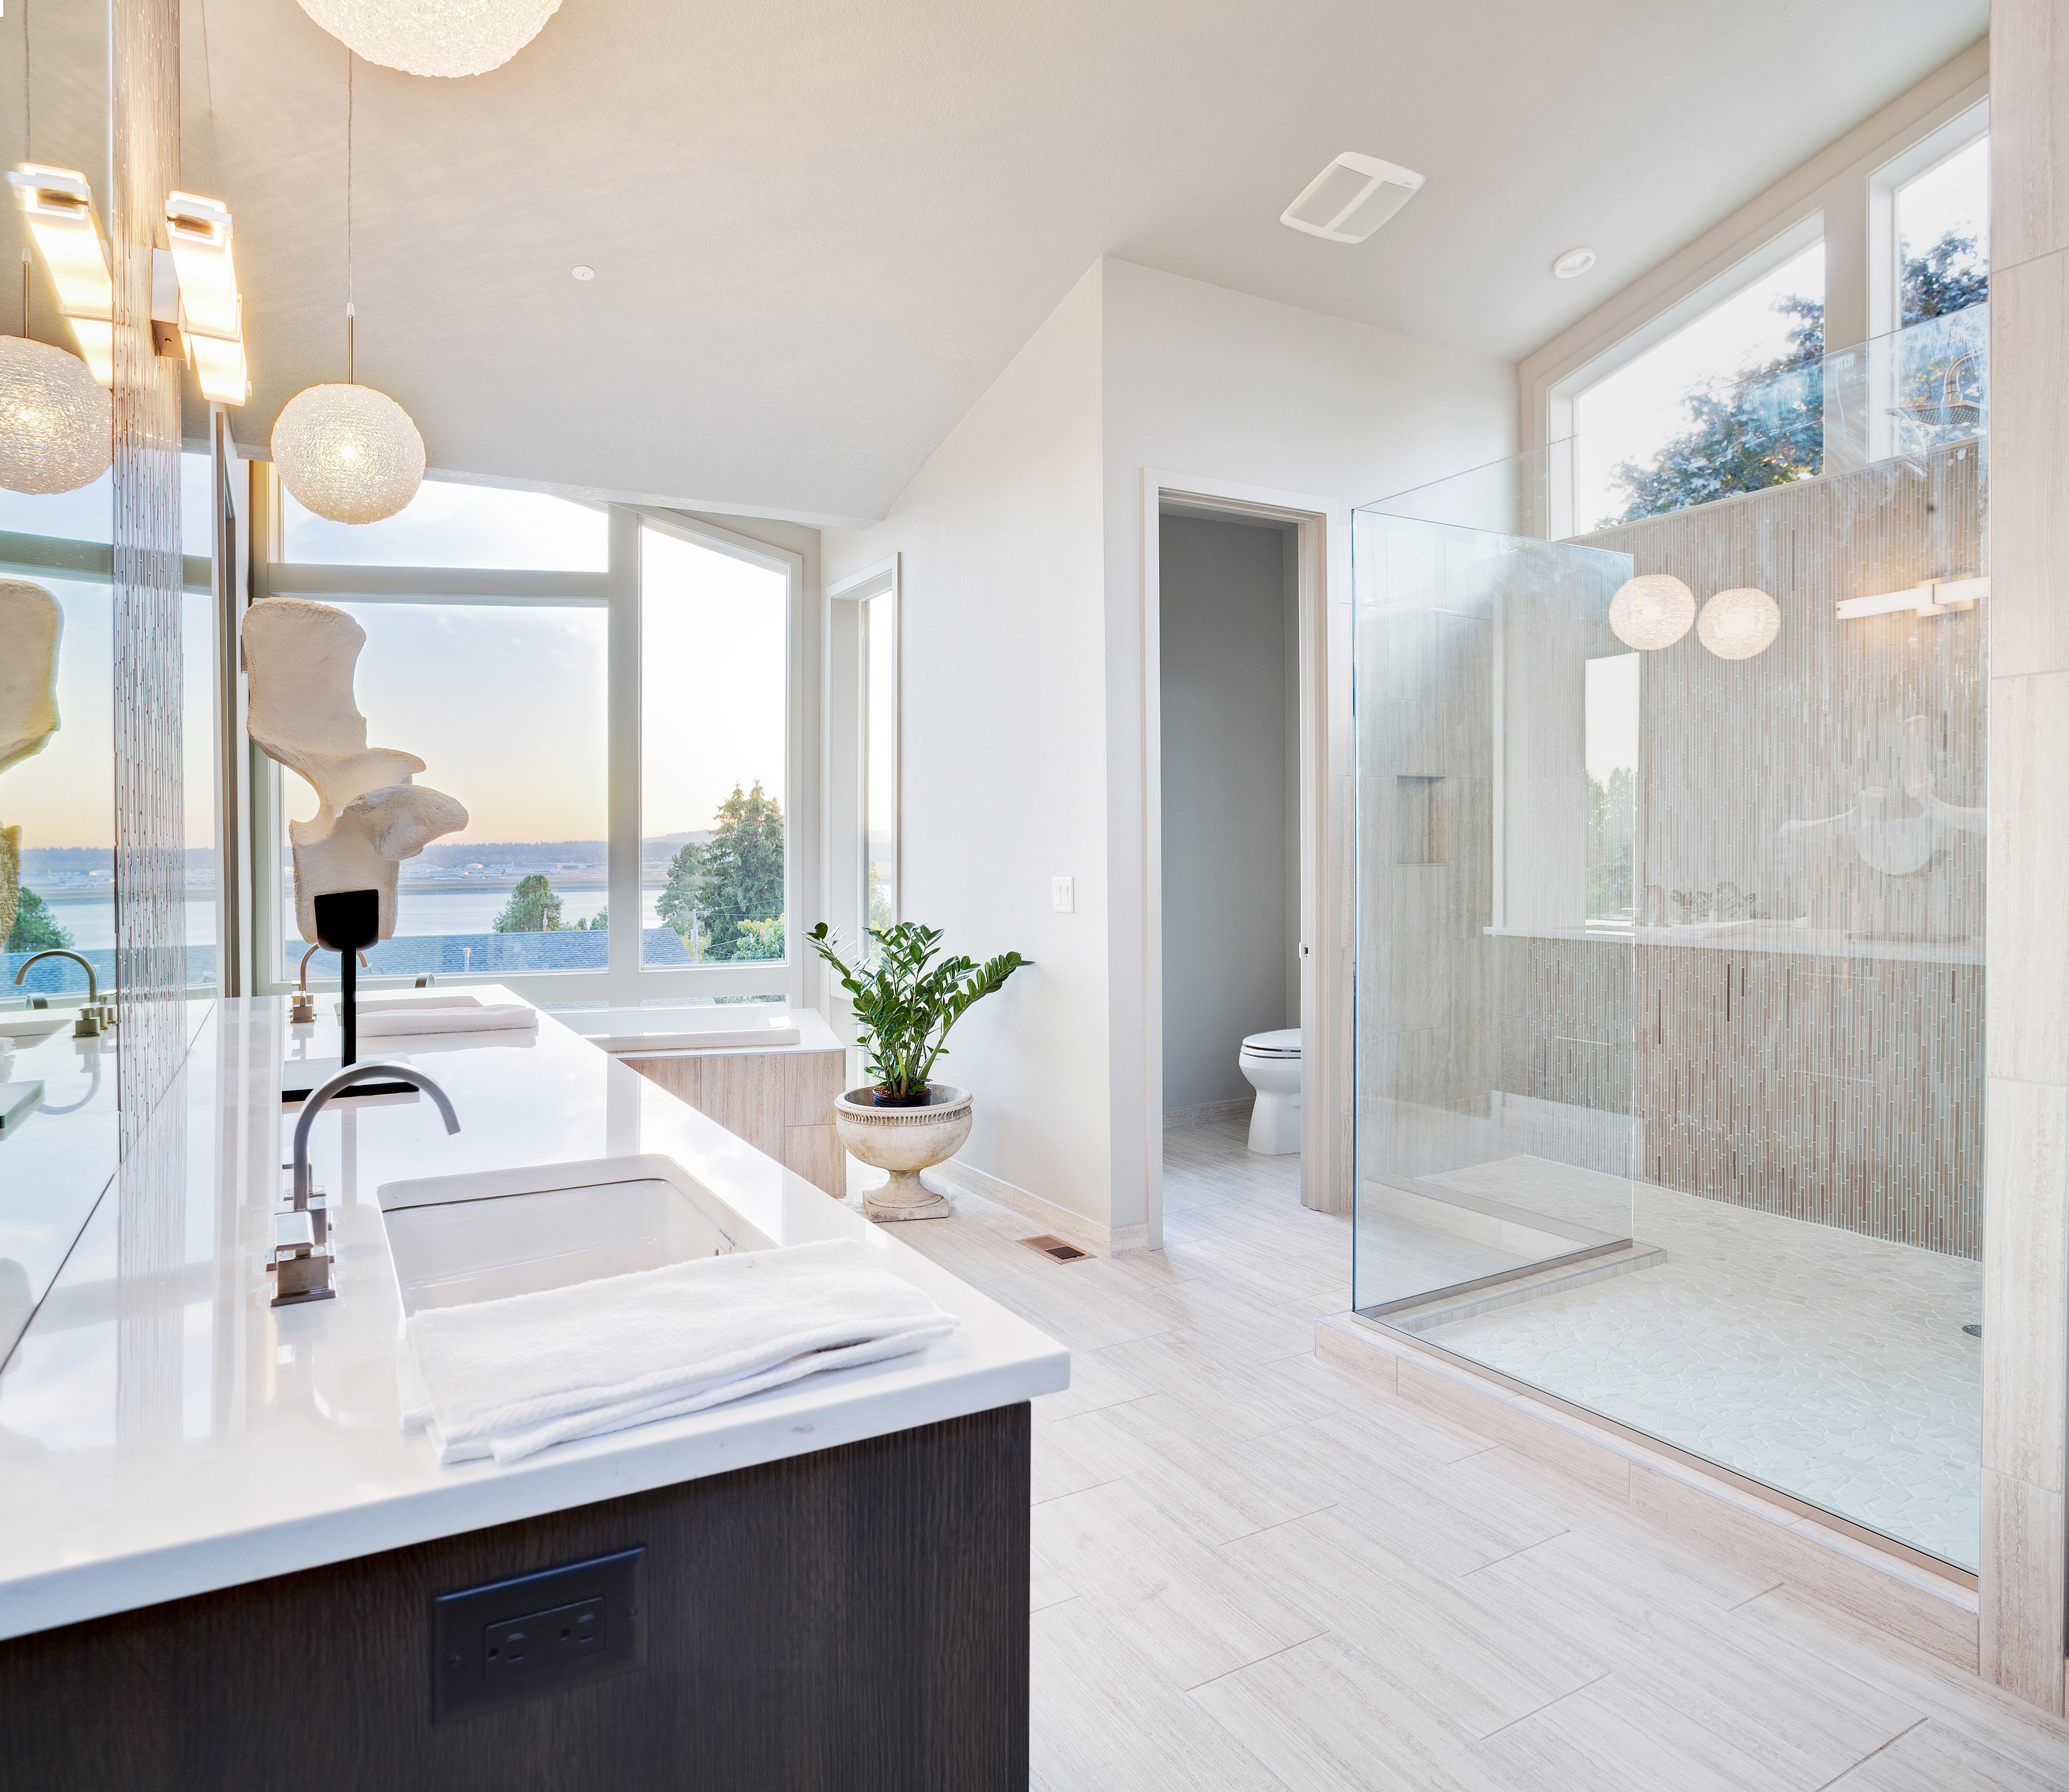 Beautiful Large Bathroom in Luxury Home.